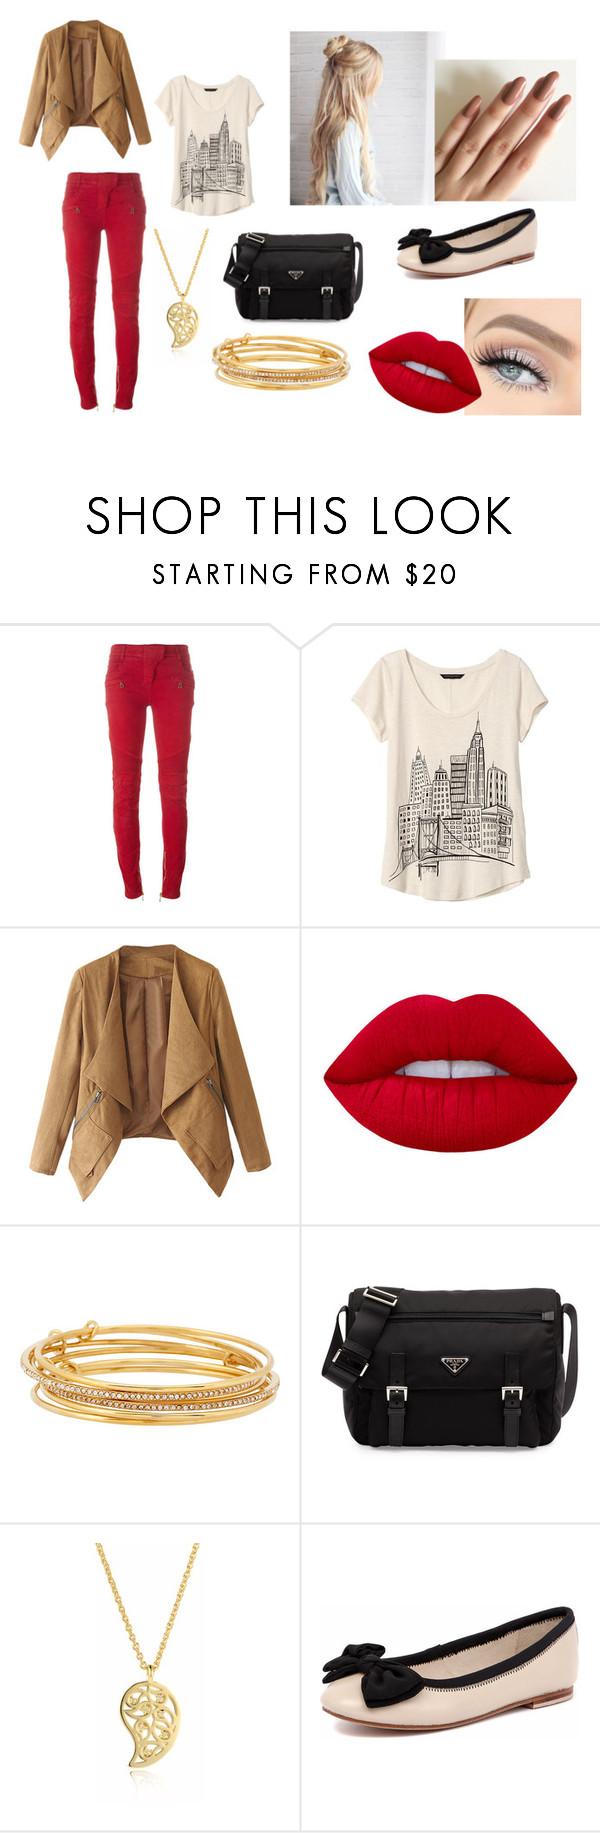 """Alexia Outfit 03"" by taylor-ross115 on Polyvore featuring Balmain, Banana Republic, Lime Crime, Kate Spade, Prada, Sonal Bhaskaran and Human Premium"